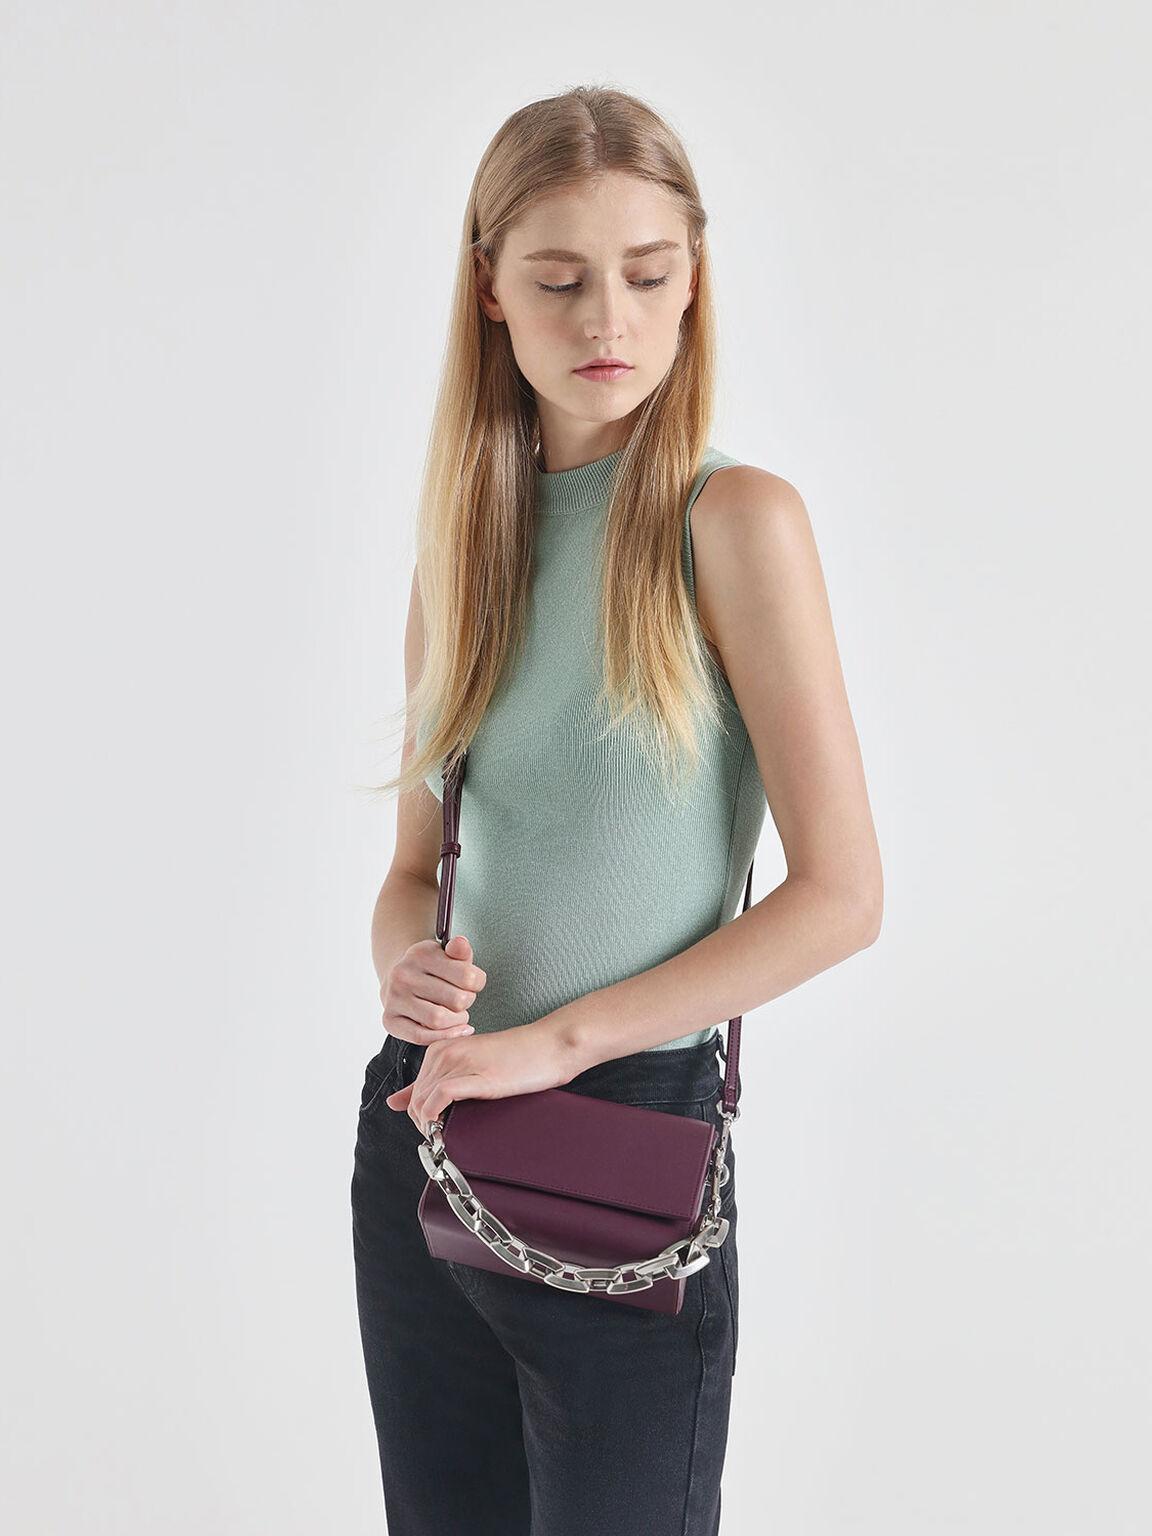 Chunky Chain Handle Crossbody Bag, Prune, hi-res